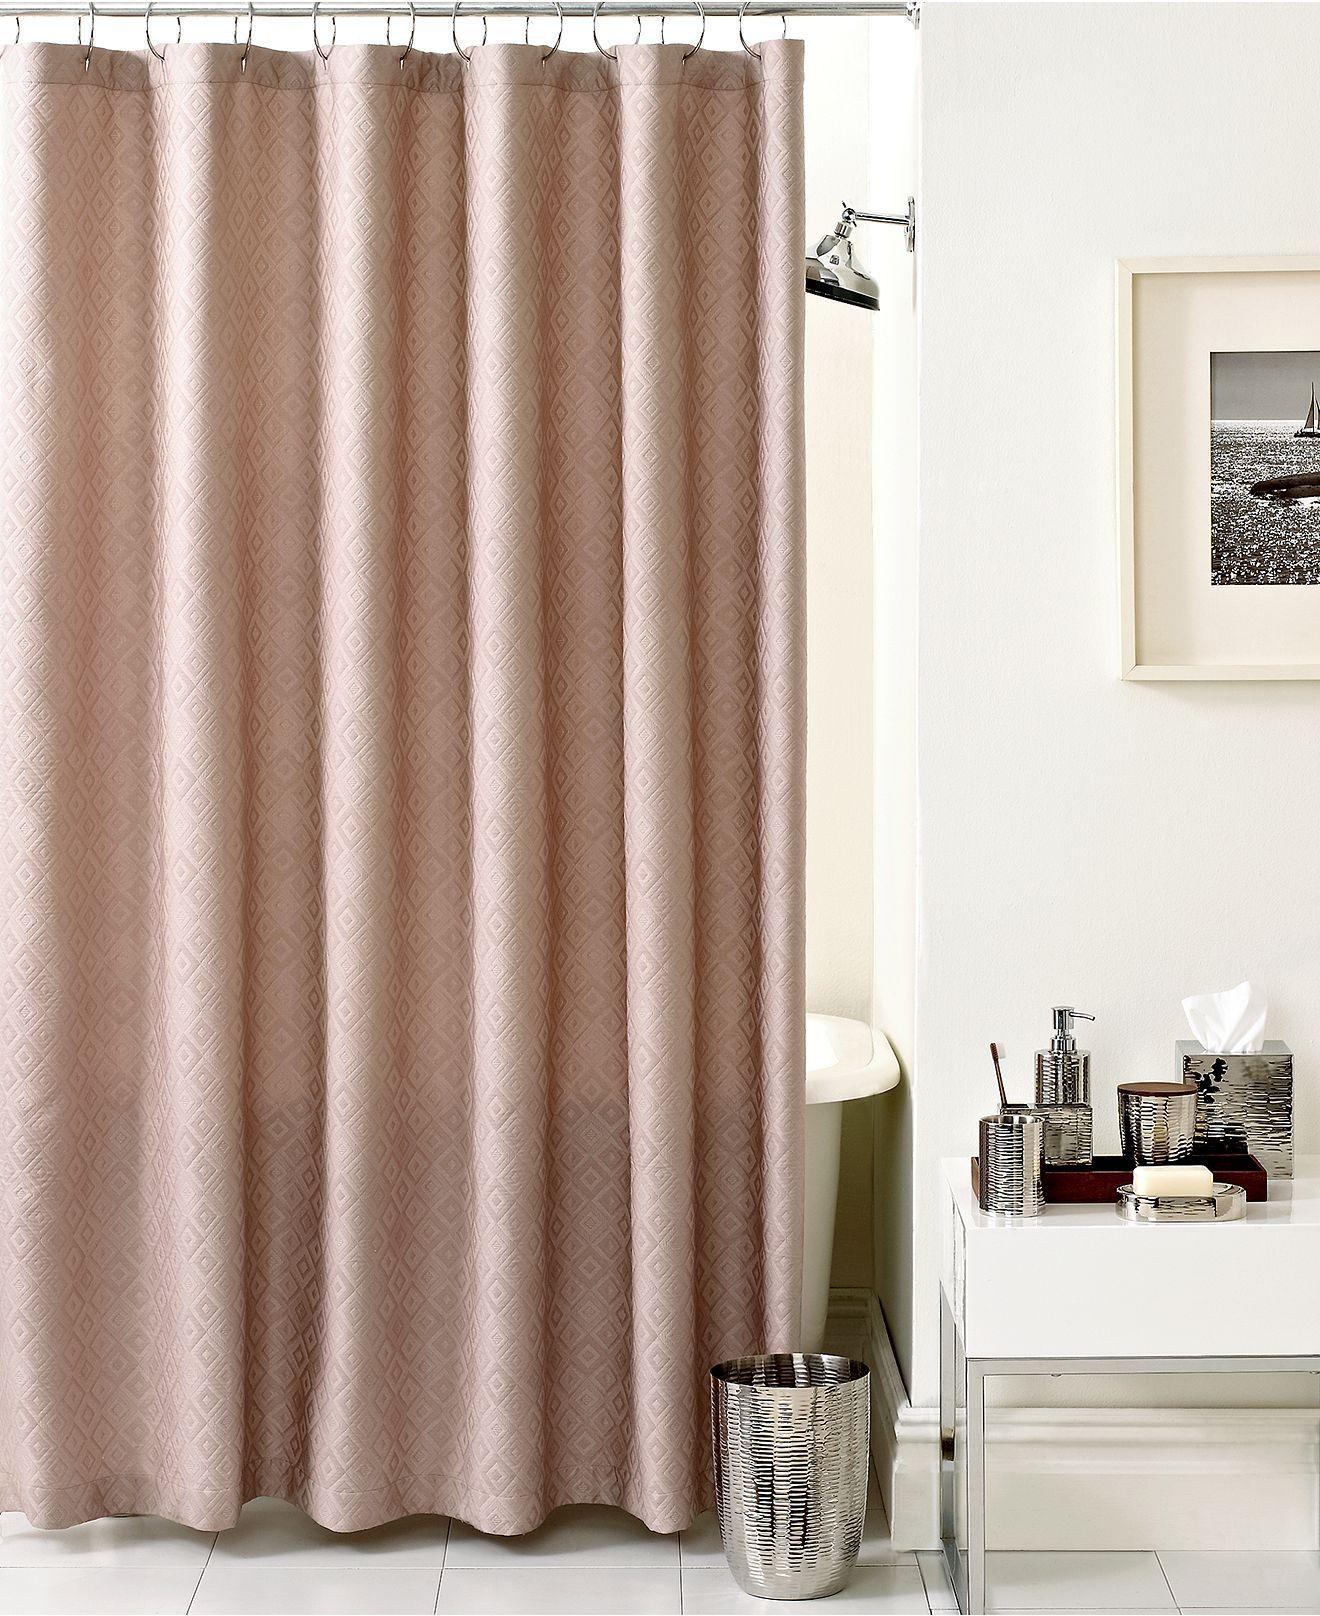 Hotel Collection Bath Diamond Matelasse Shower Curtain Shower